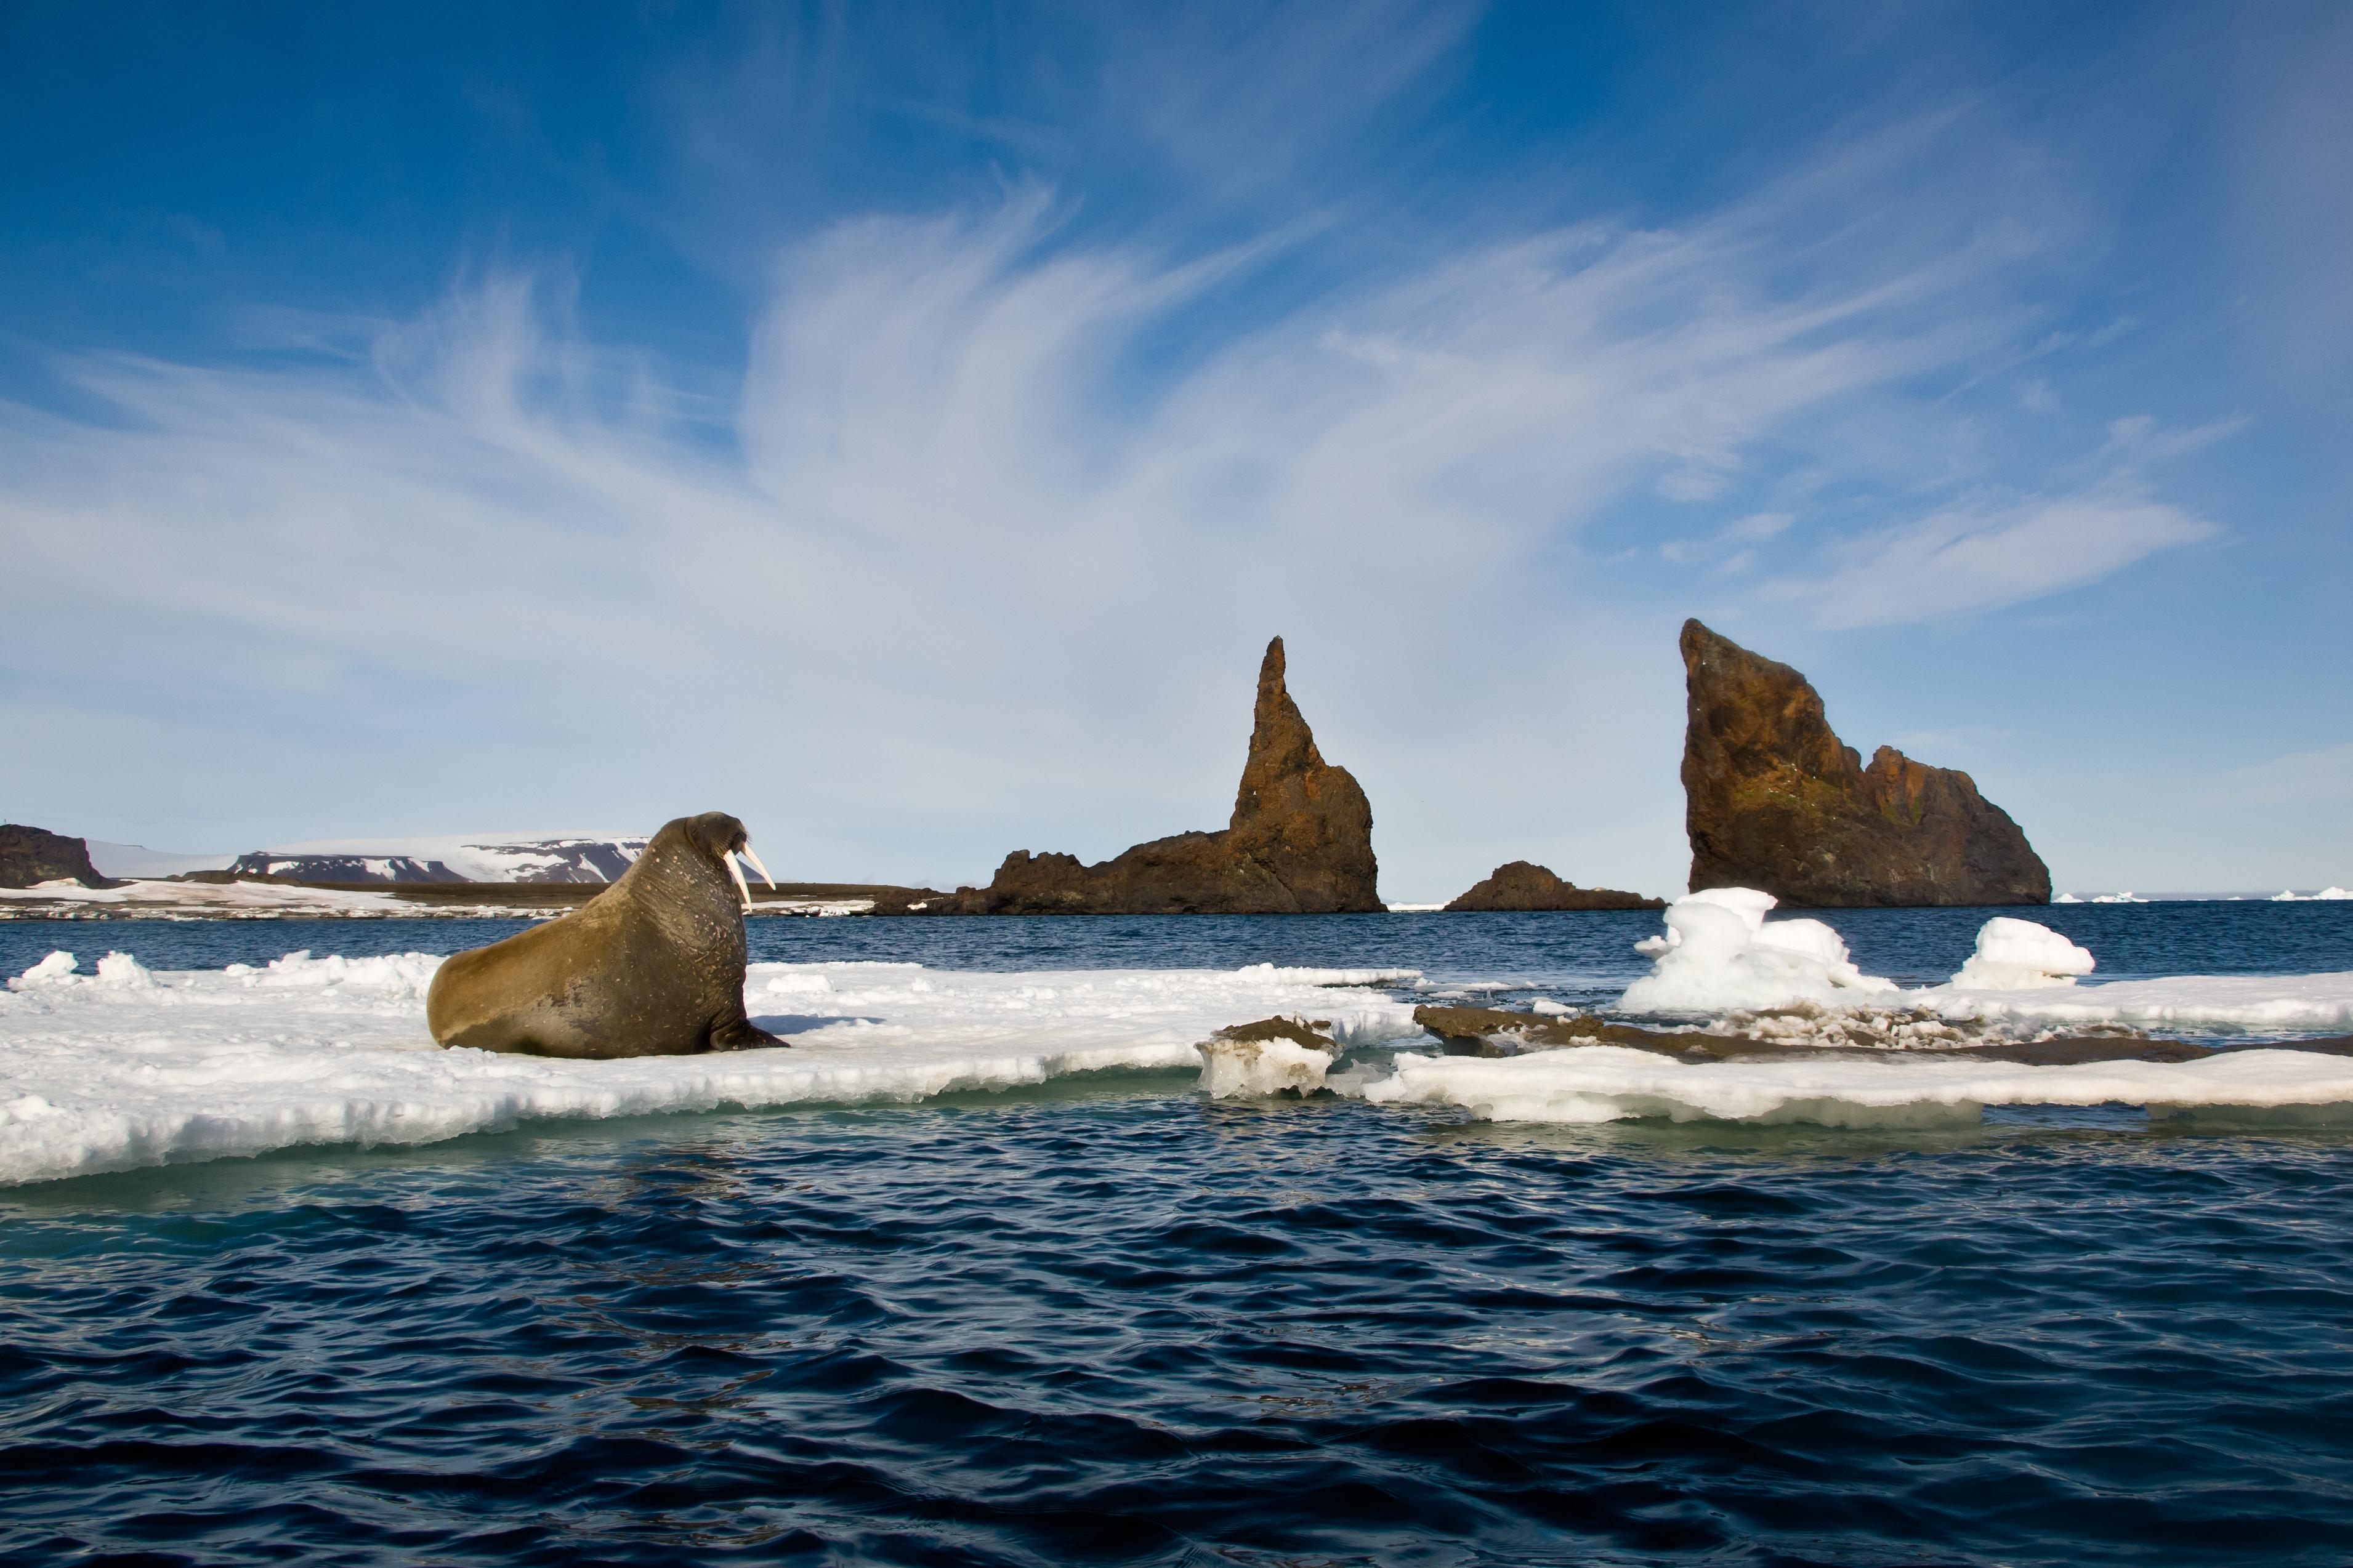 Walrus on an ice flow Franz Josef Land